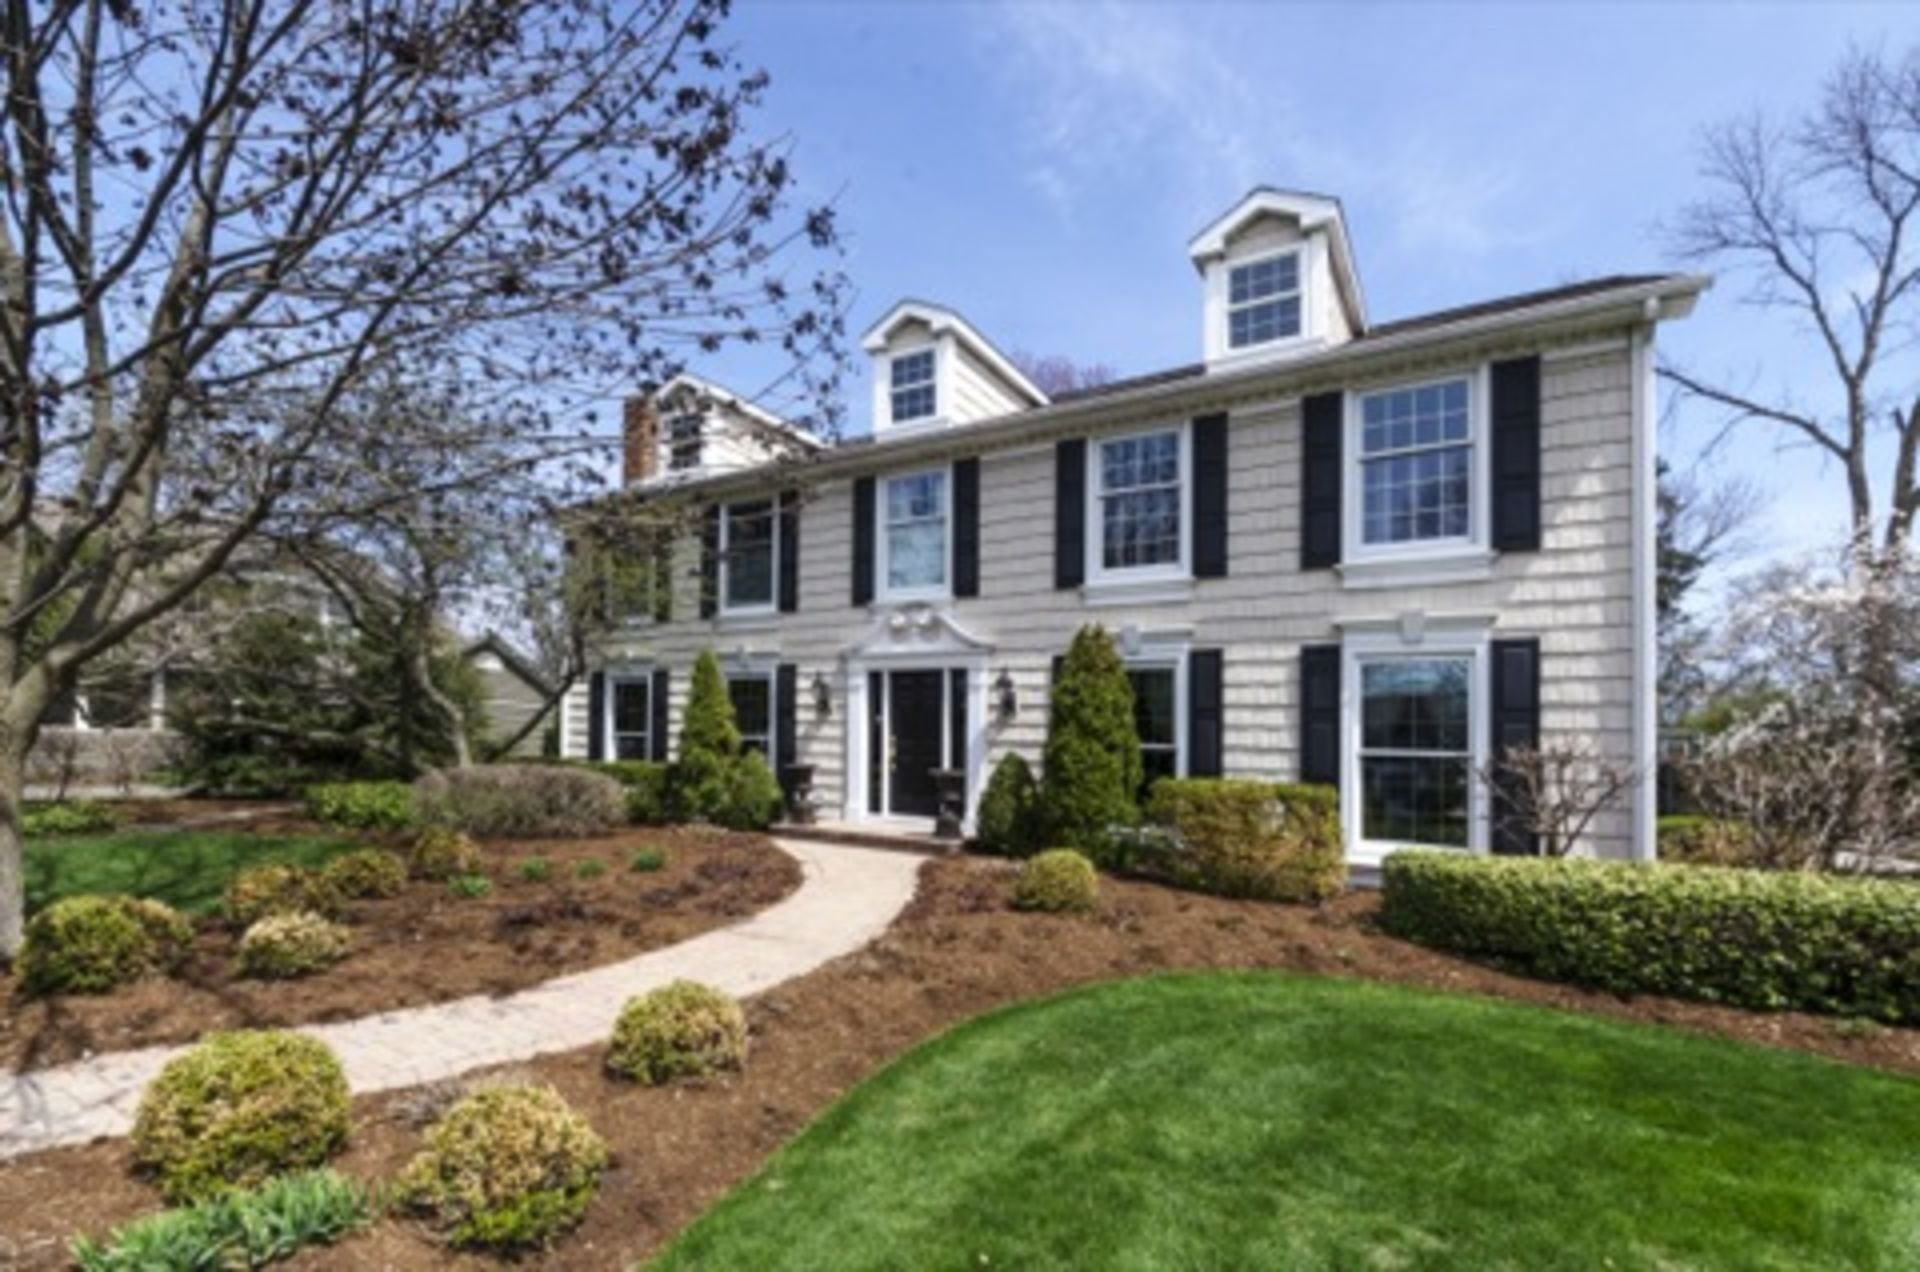 Wheaton Real Estate Update 1Q 2019